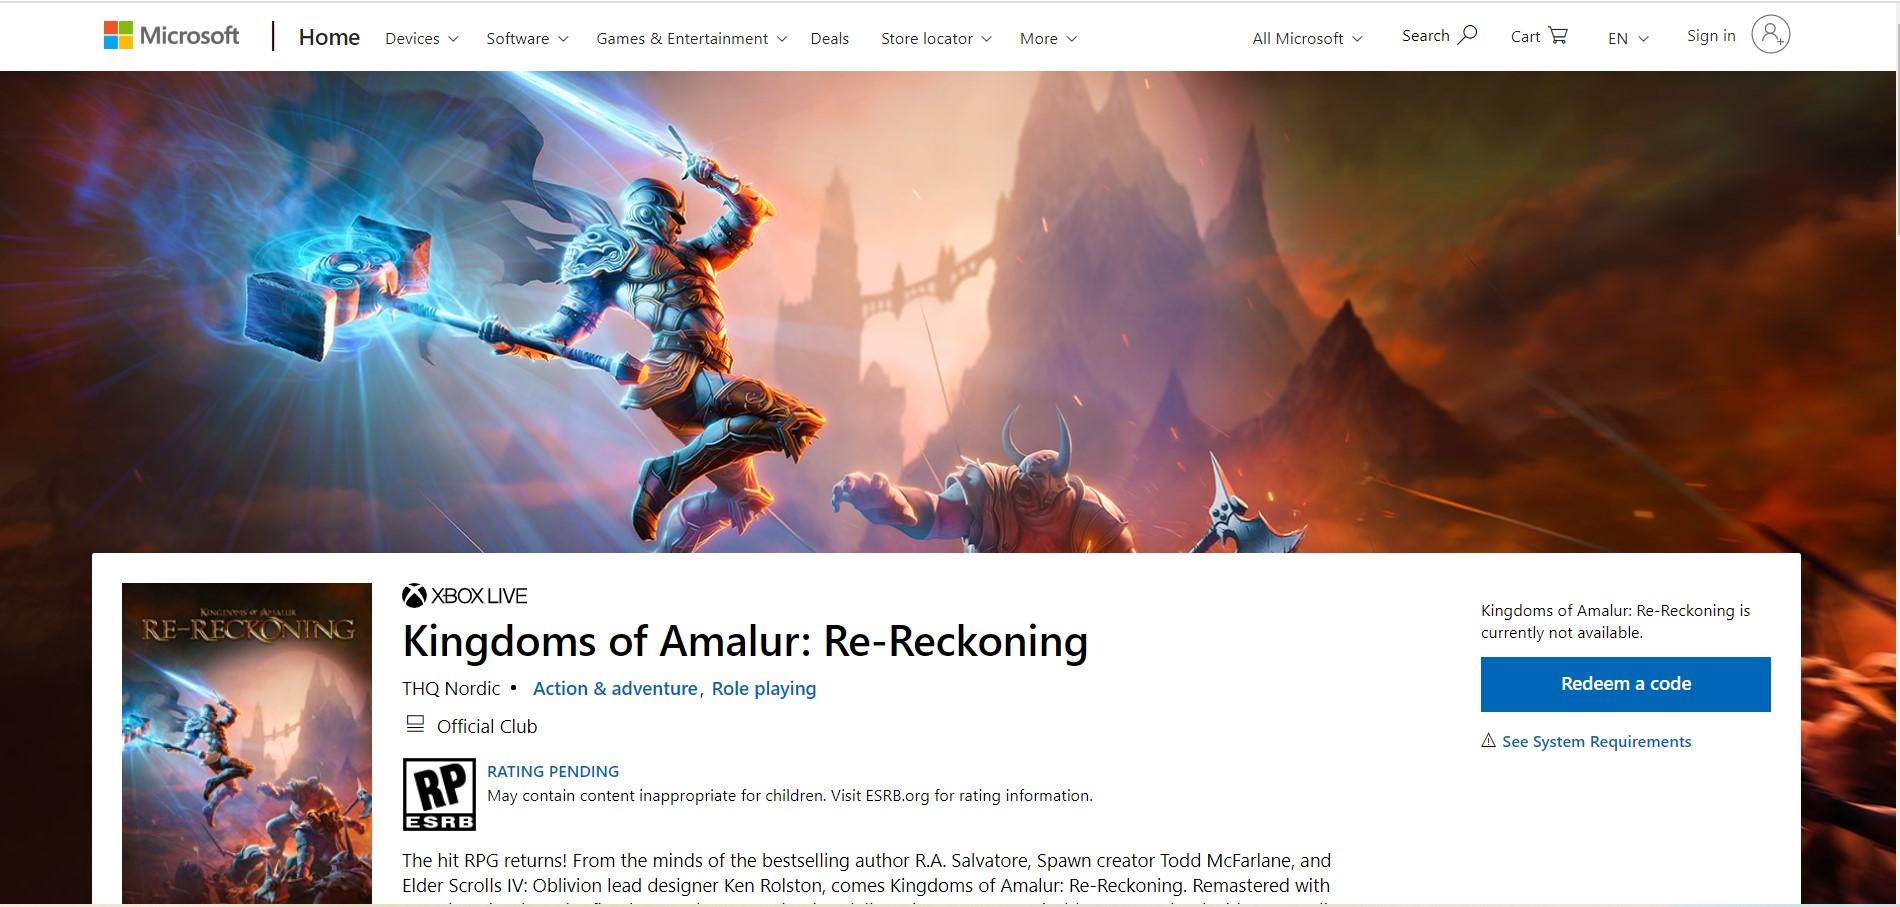 To Remaster του Kingdoms of Amalur : Reckoning έκανε την εμφάνιση του στο XBOX Store